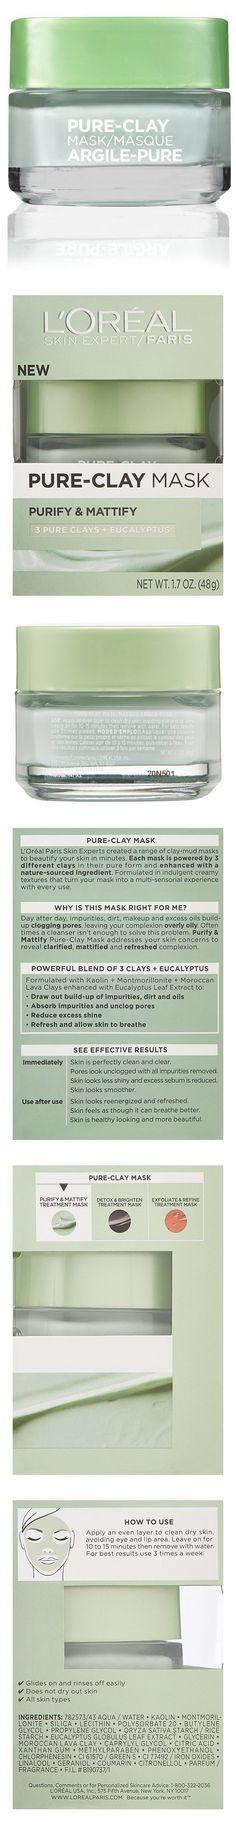 L'Oreal Paris Skin Care Pure Clay Mask Purify and Mattify #beauty #lorealparis